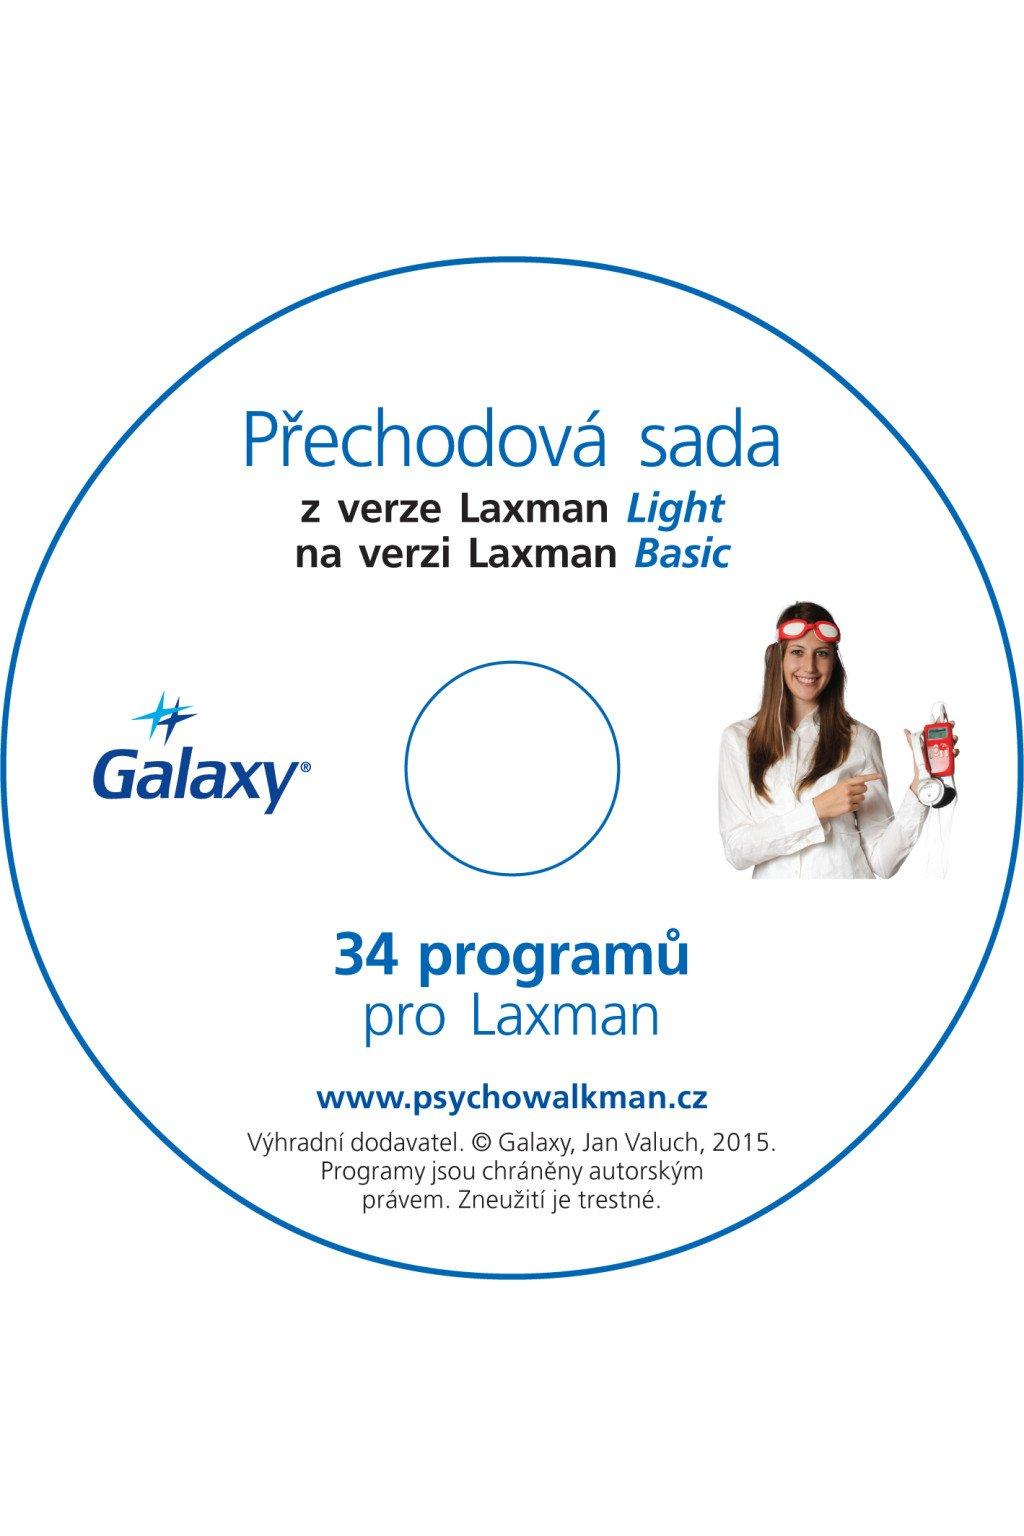 155 prechodova sada z laxman light na laxman basic